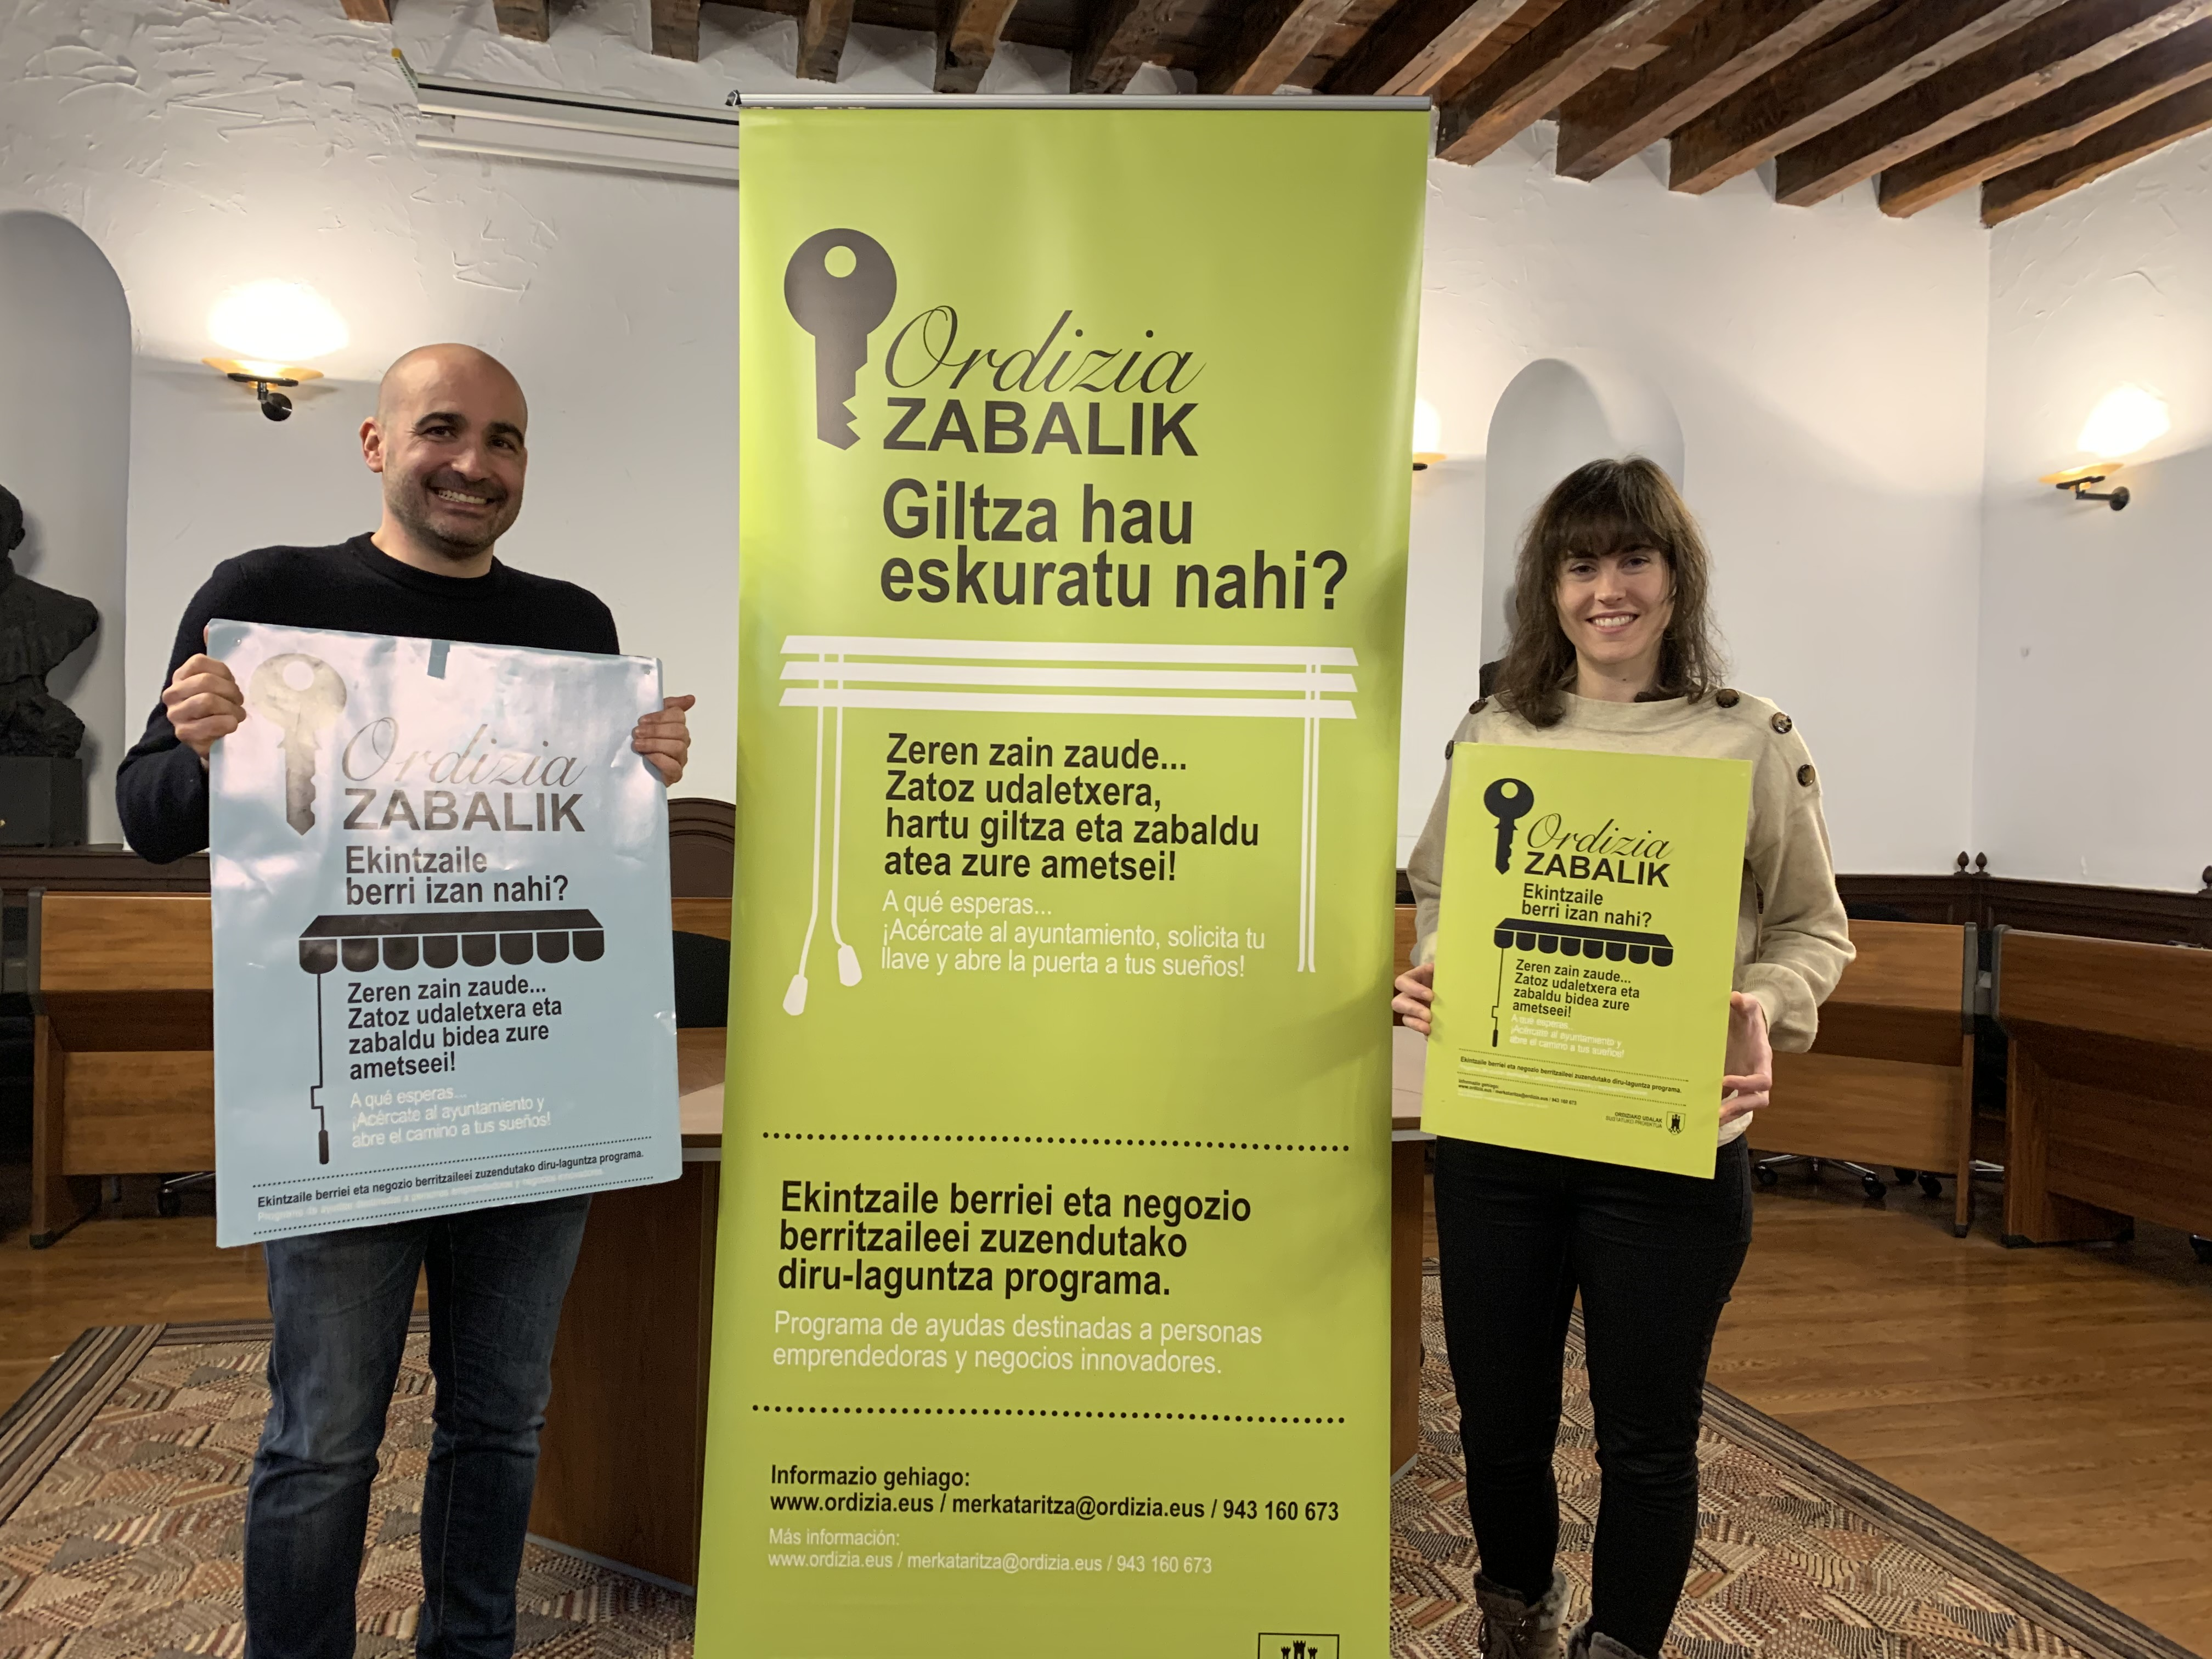 Ordizia Zabalik